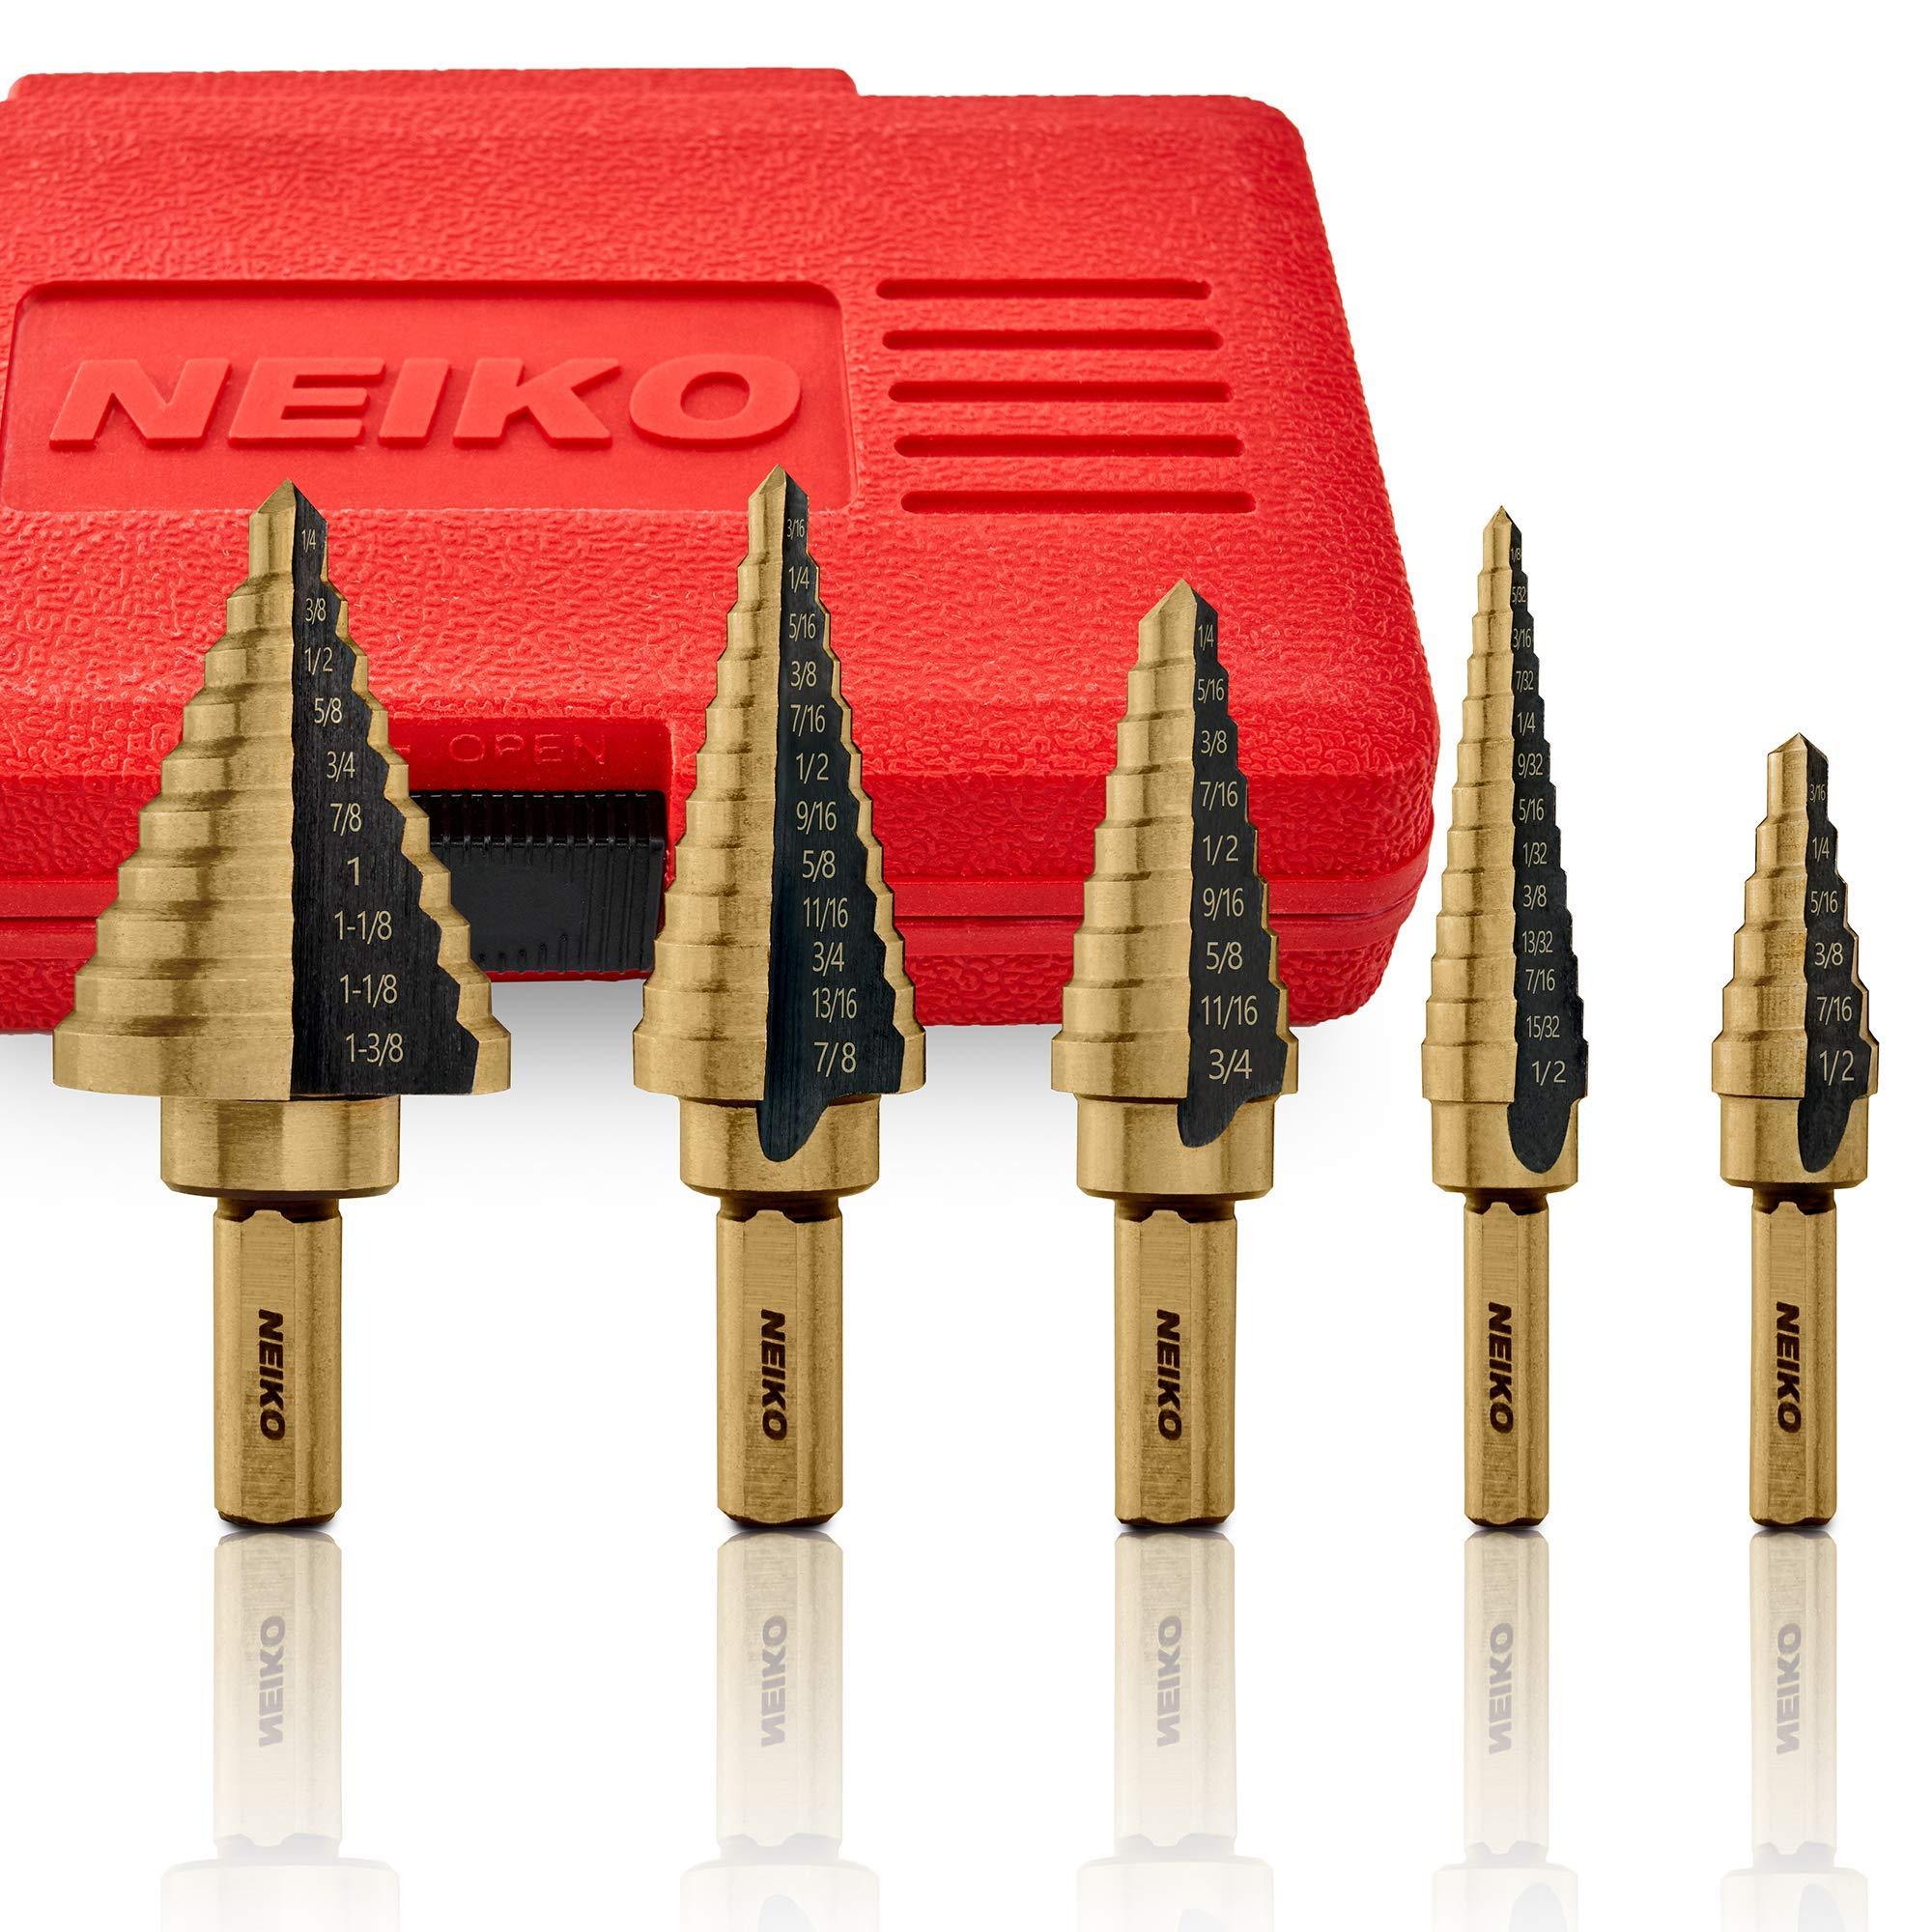 amoolo Titanium Step Drill Bit Set Multiple Hole Drilling Cone Bit Set Wood Total 50 Sizes HSS Unibit with Double Cutting Blades for Metal 5Pcs Plastic